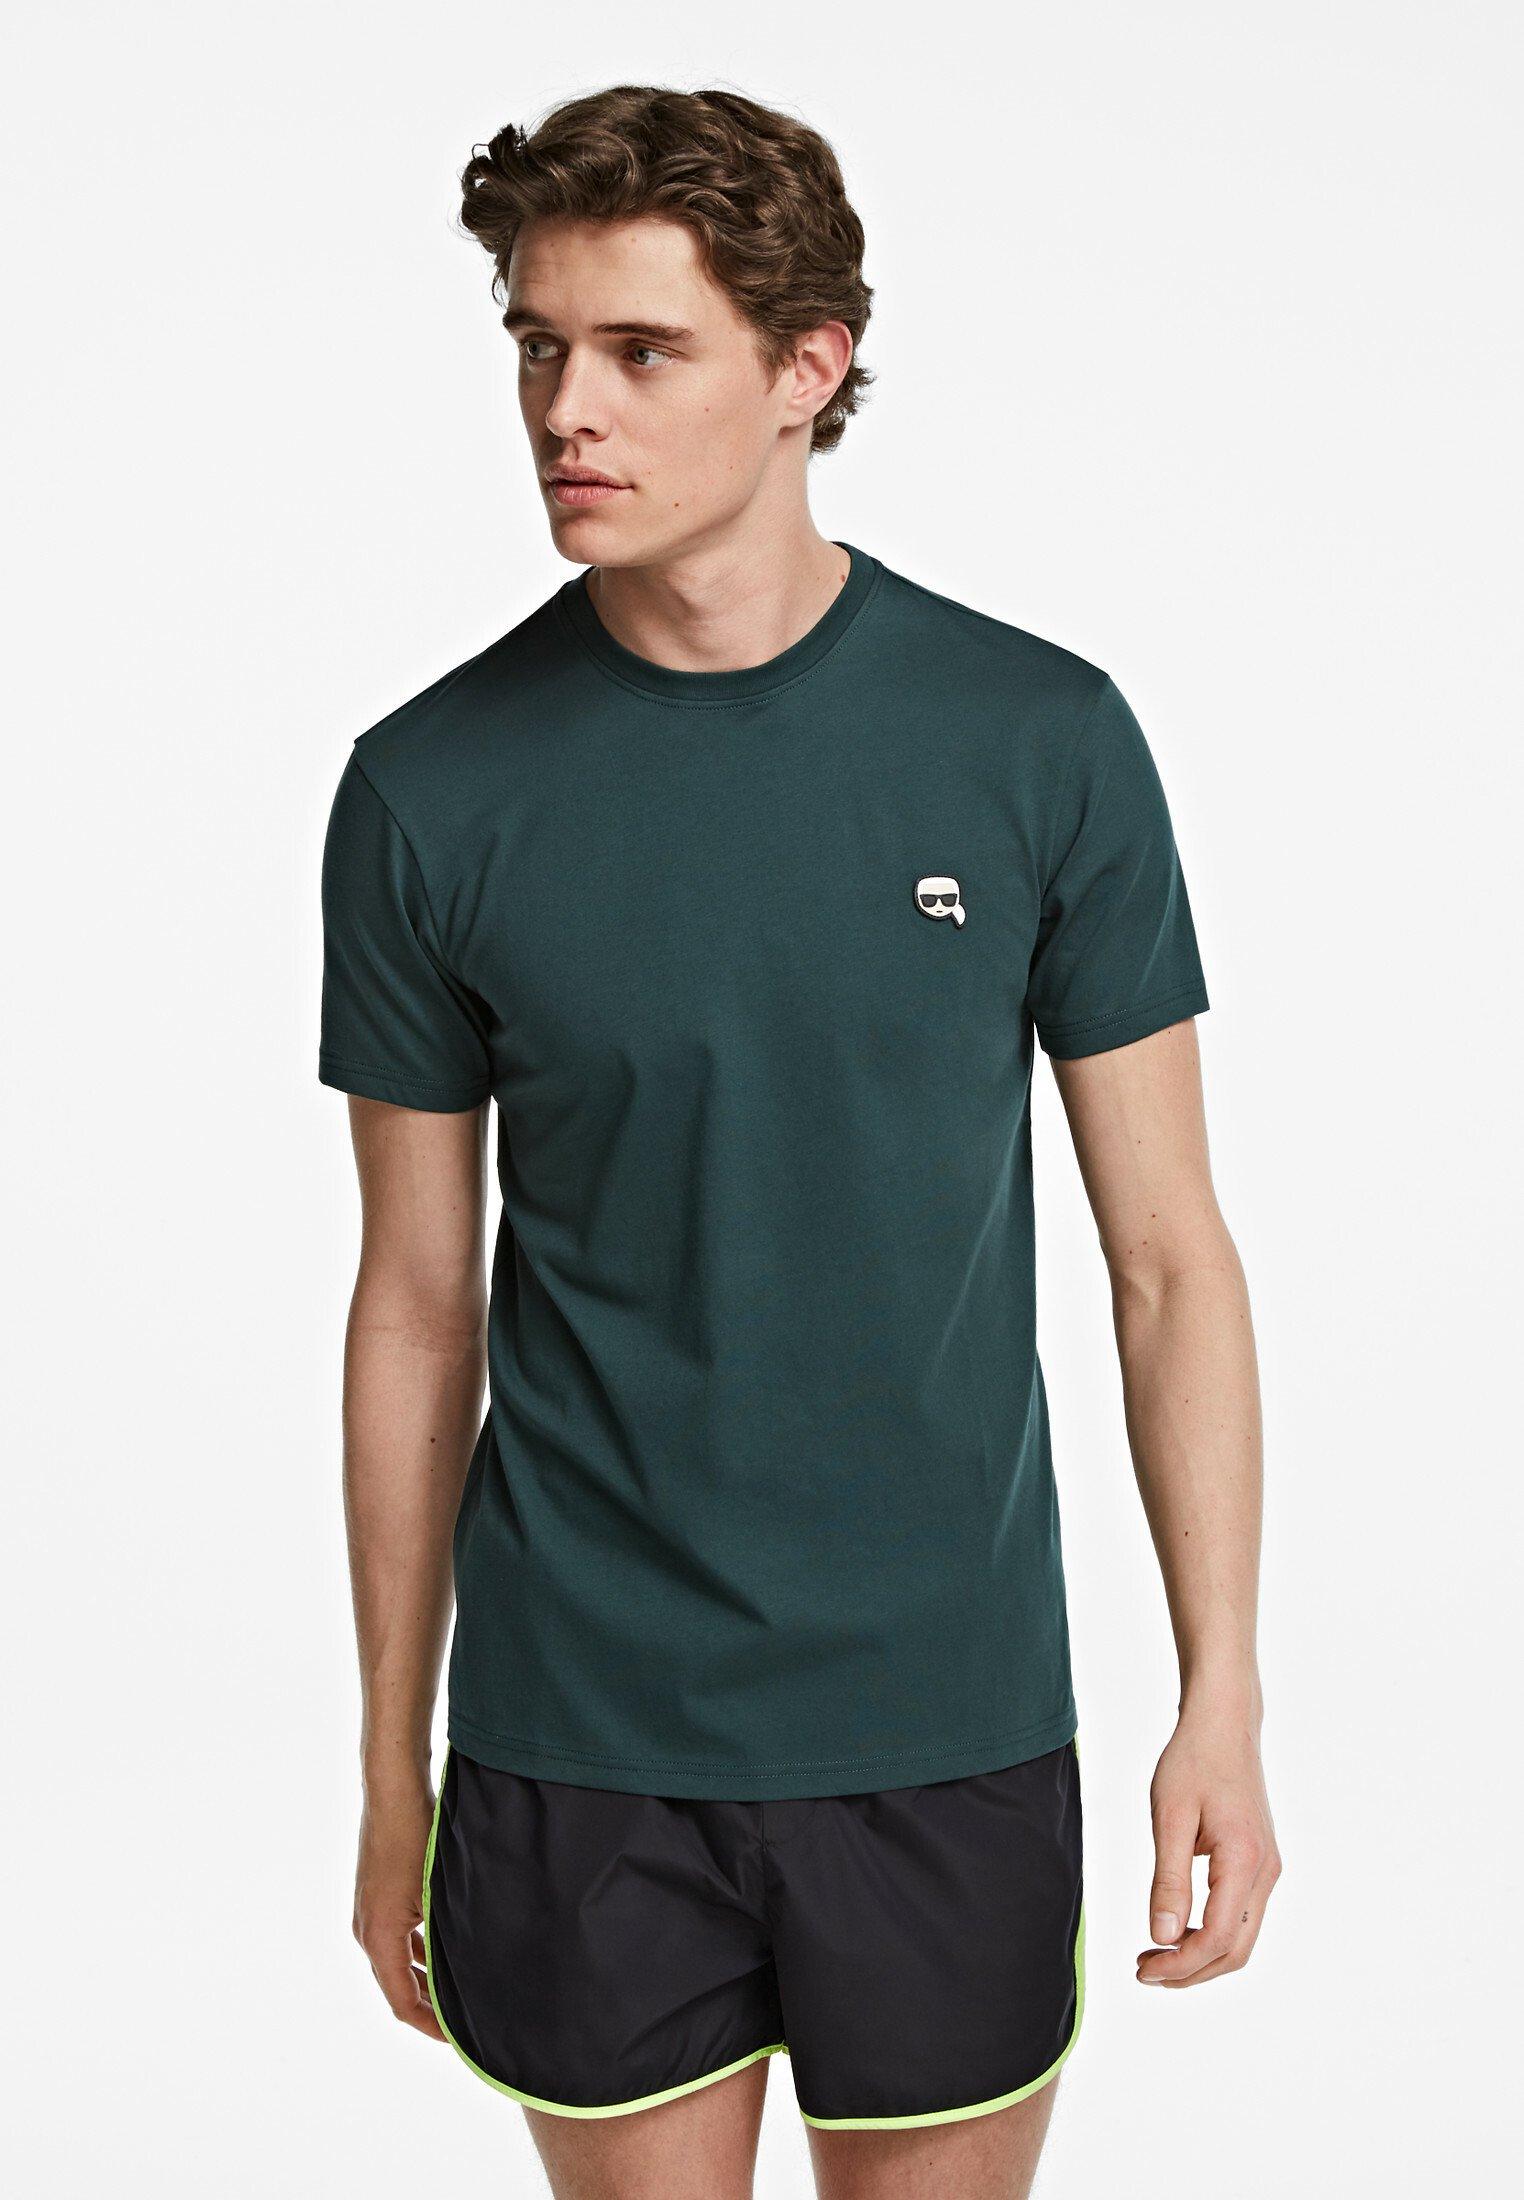 Karl Lagerfeld Ikonik - T-shirt Basic Green Gable Iokuz